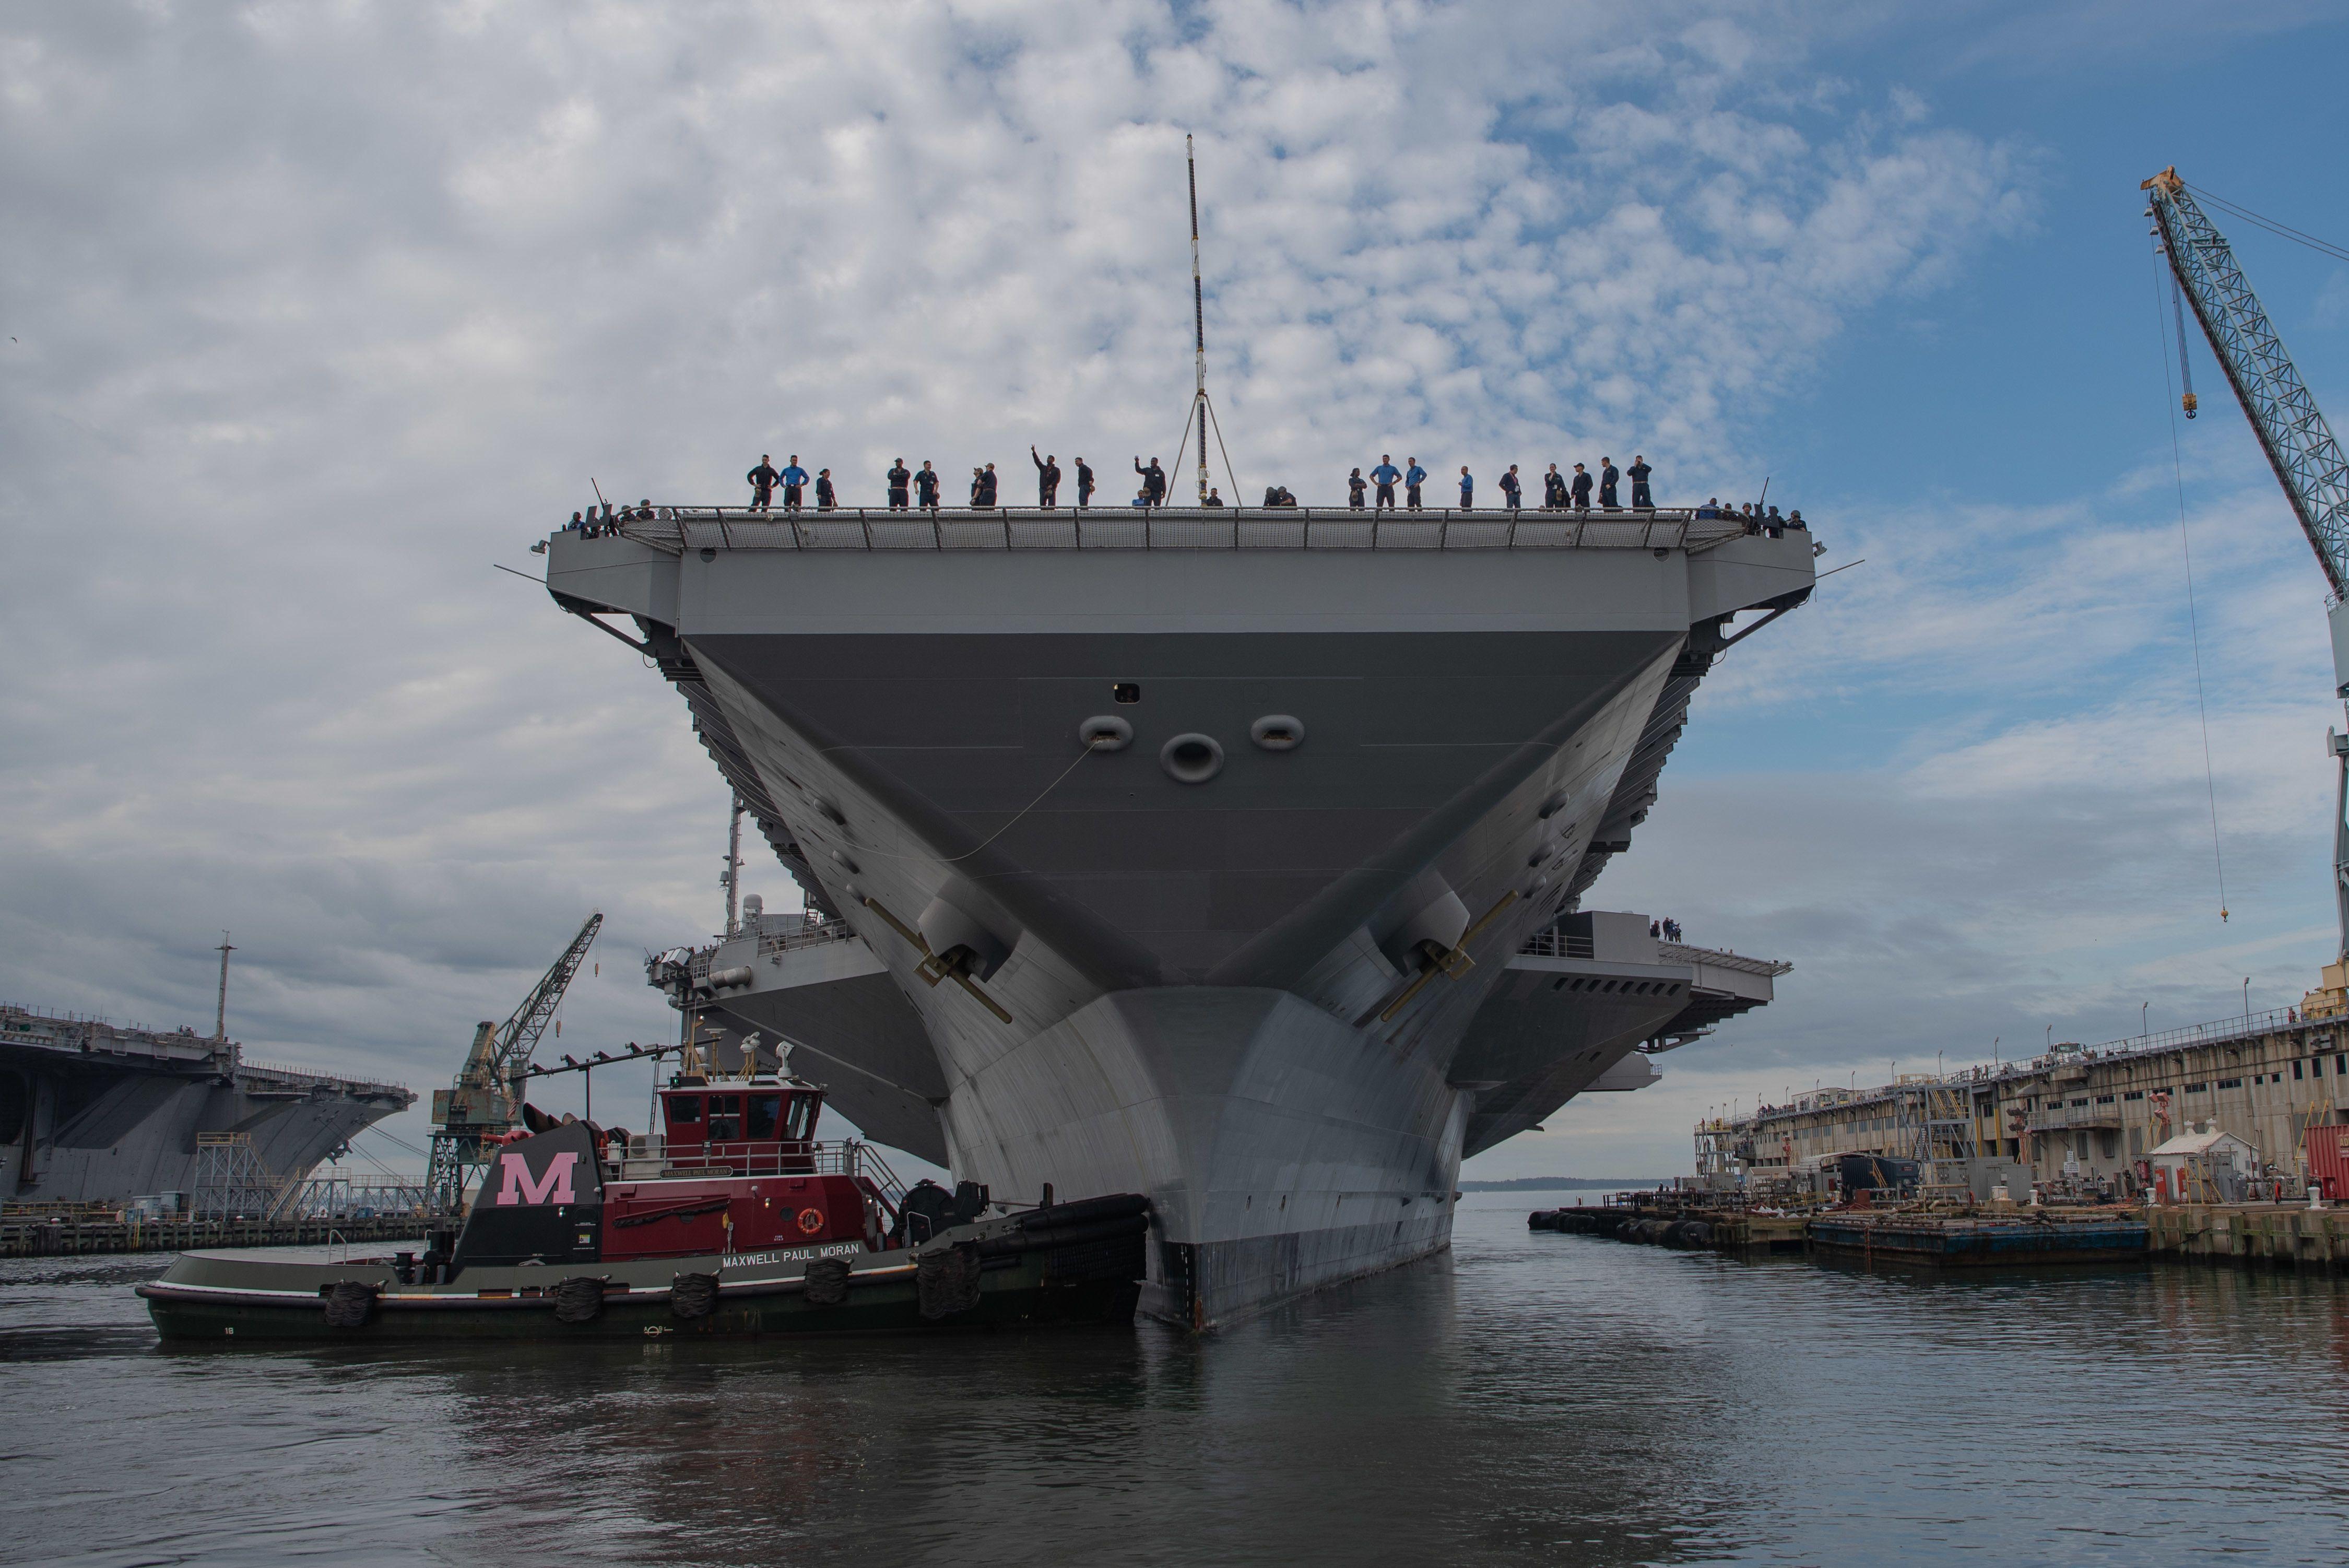 The U.S.'s $13 Billion Aircraft Carrier Has an Toilet Problem